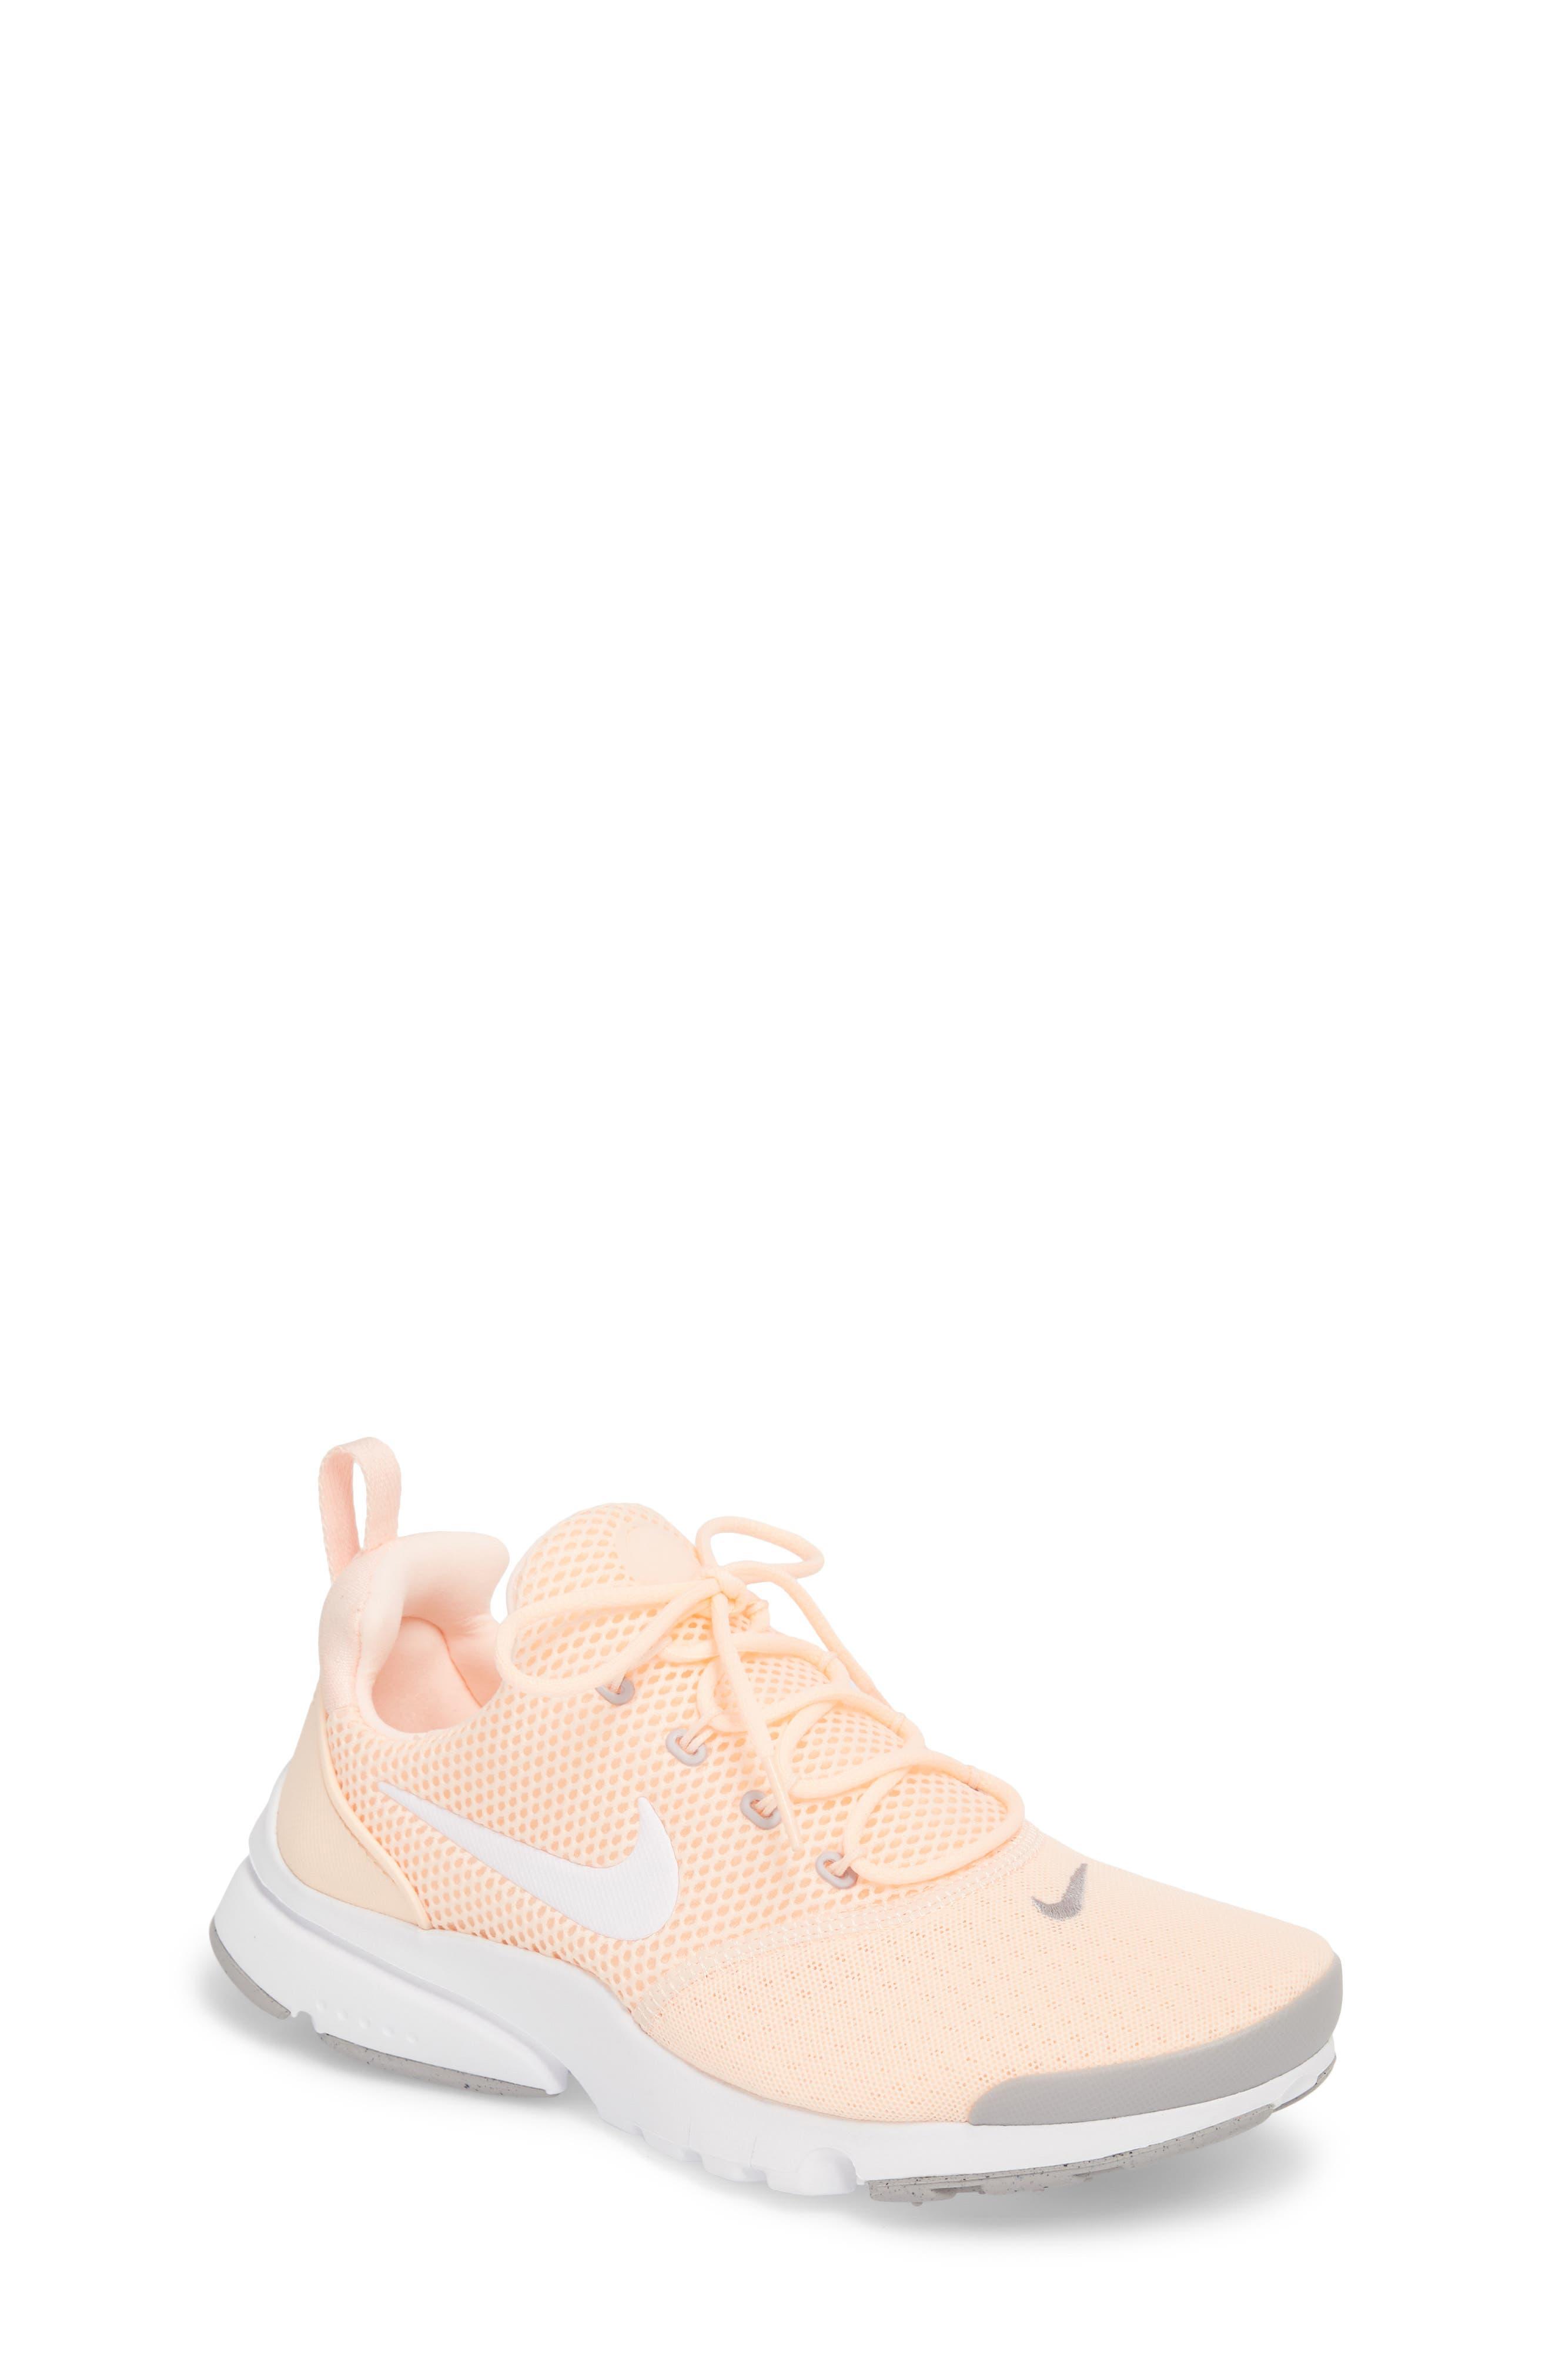 Nike Presto Fly Sneaker (Big Kid)